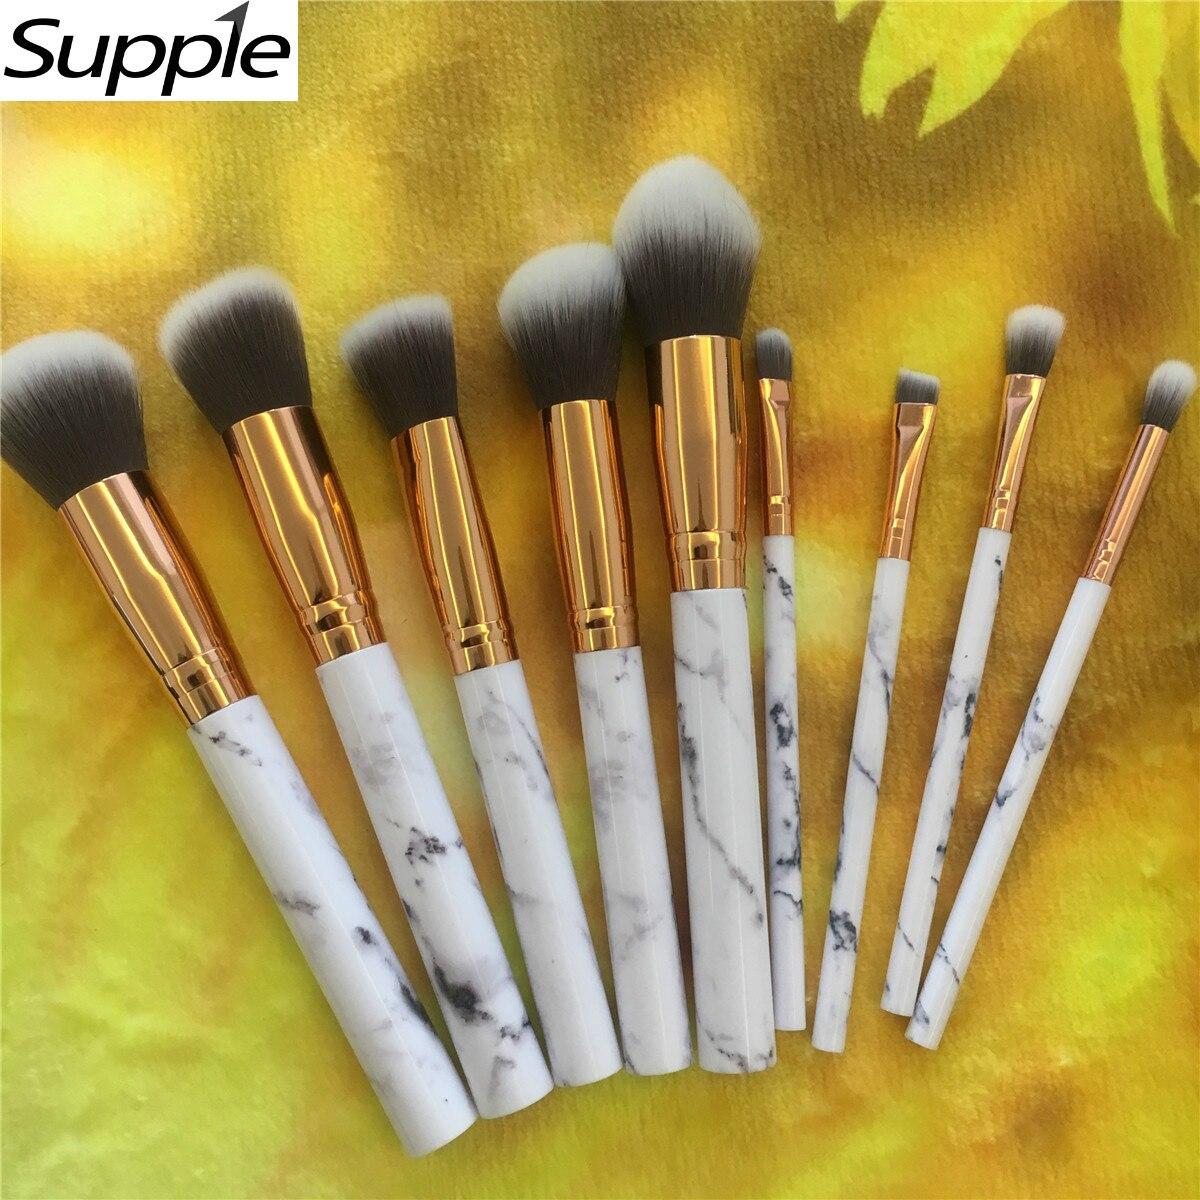 Professional Women Marble Makeup Brushes Extremely Soft Makeup Brush Set 10pcs Foundation Powder Brush Marble Make Up Tools